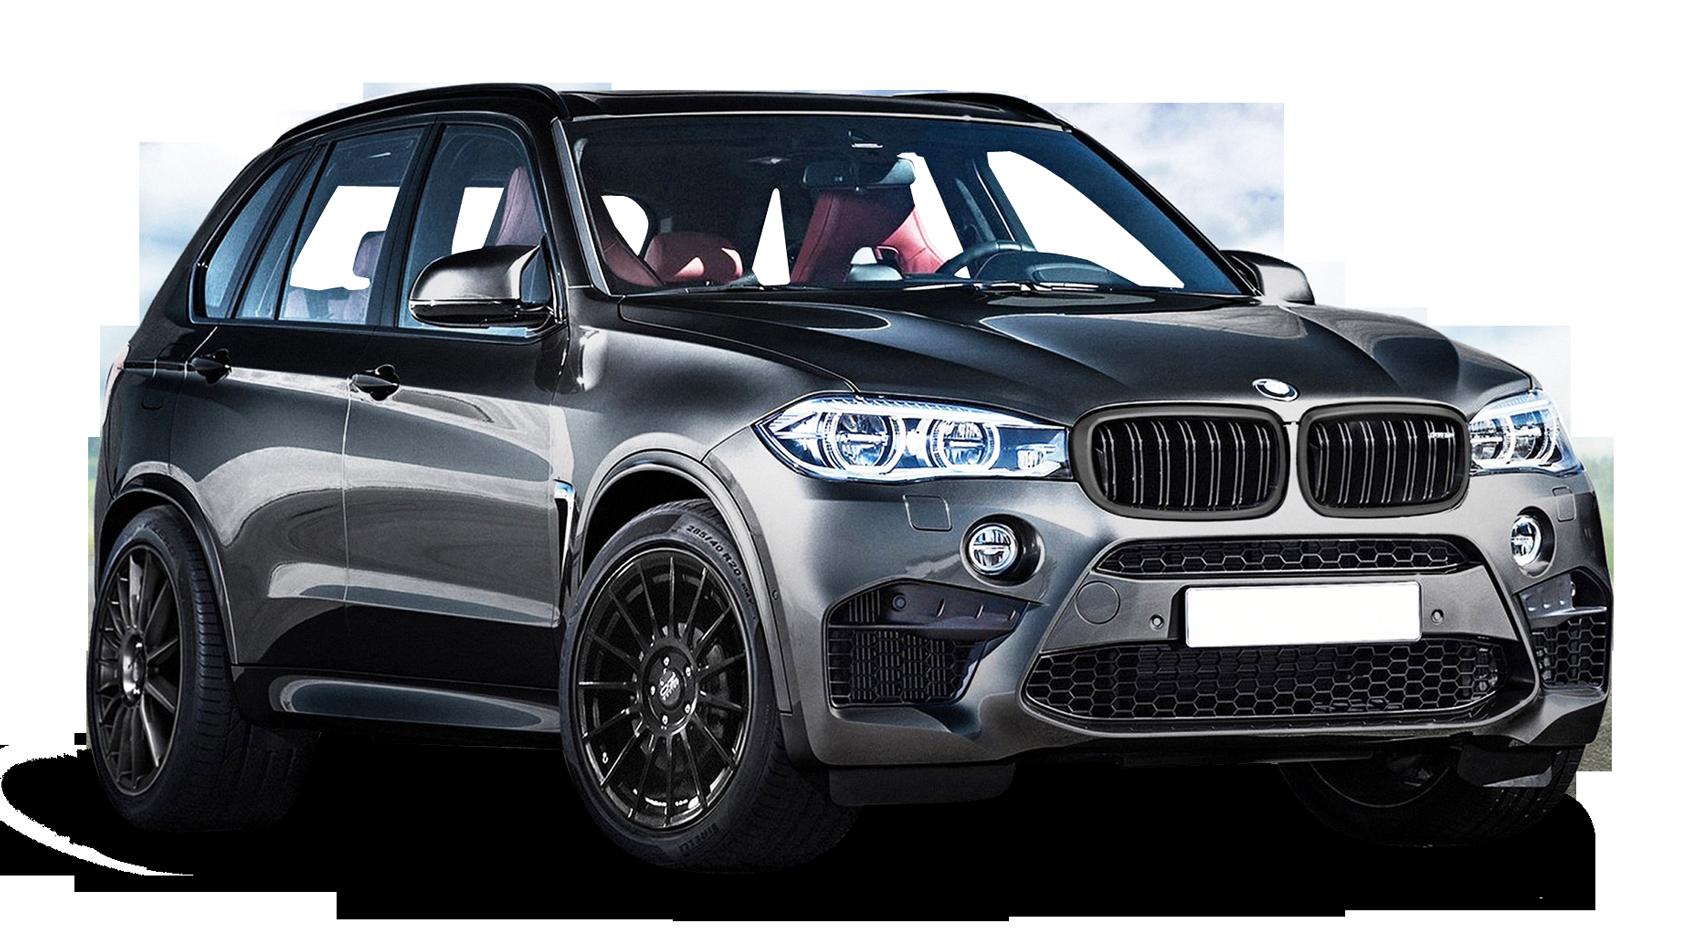 BMW X5 Black Car PNG Image.